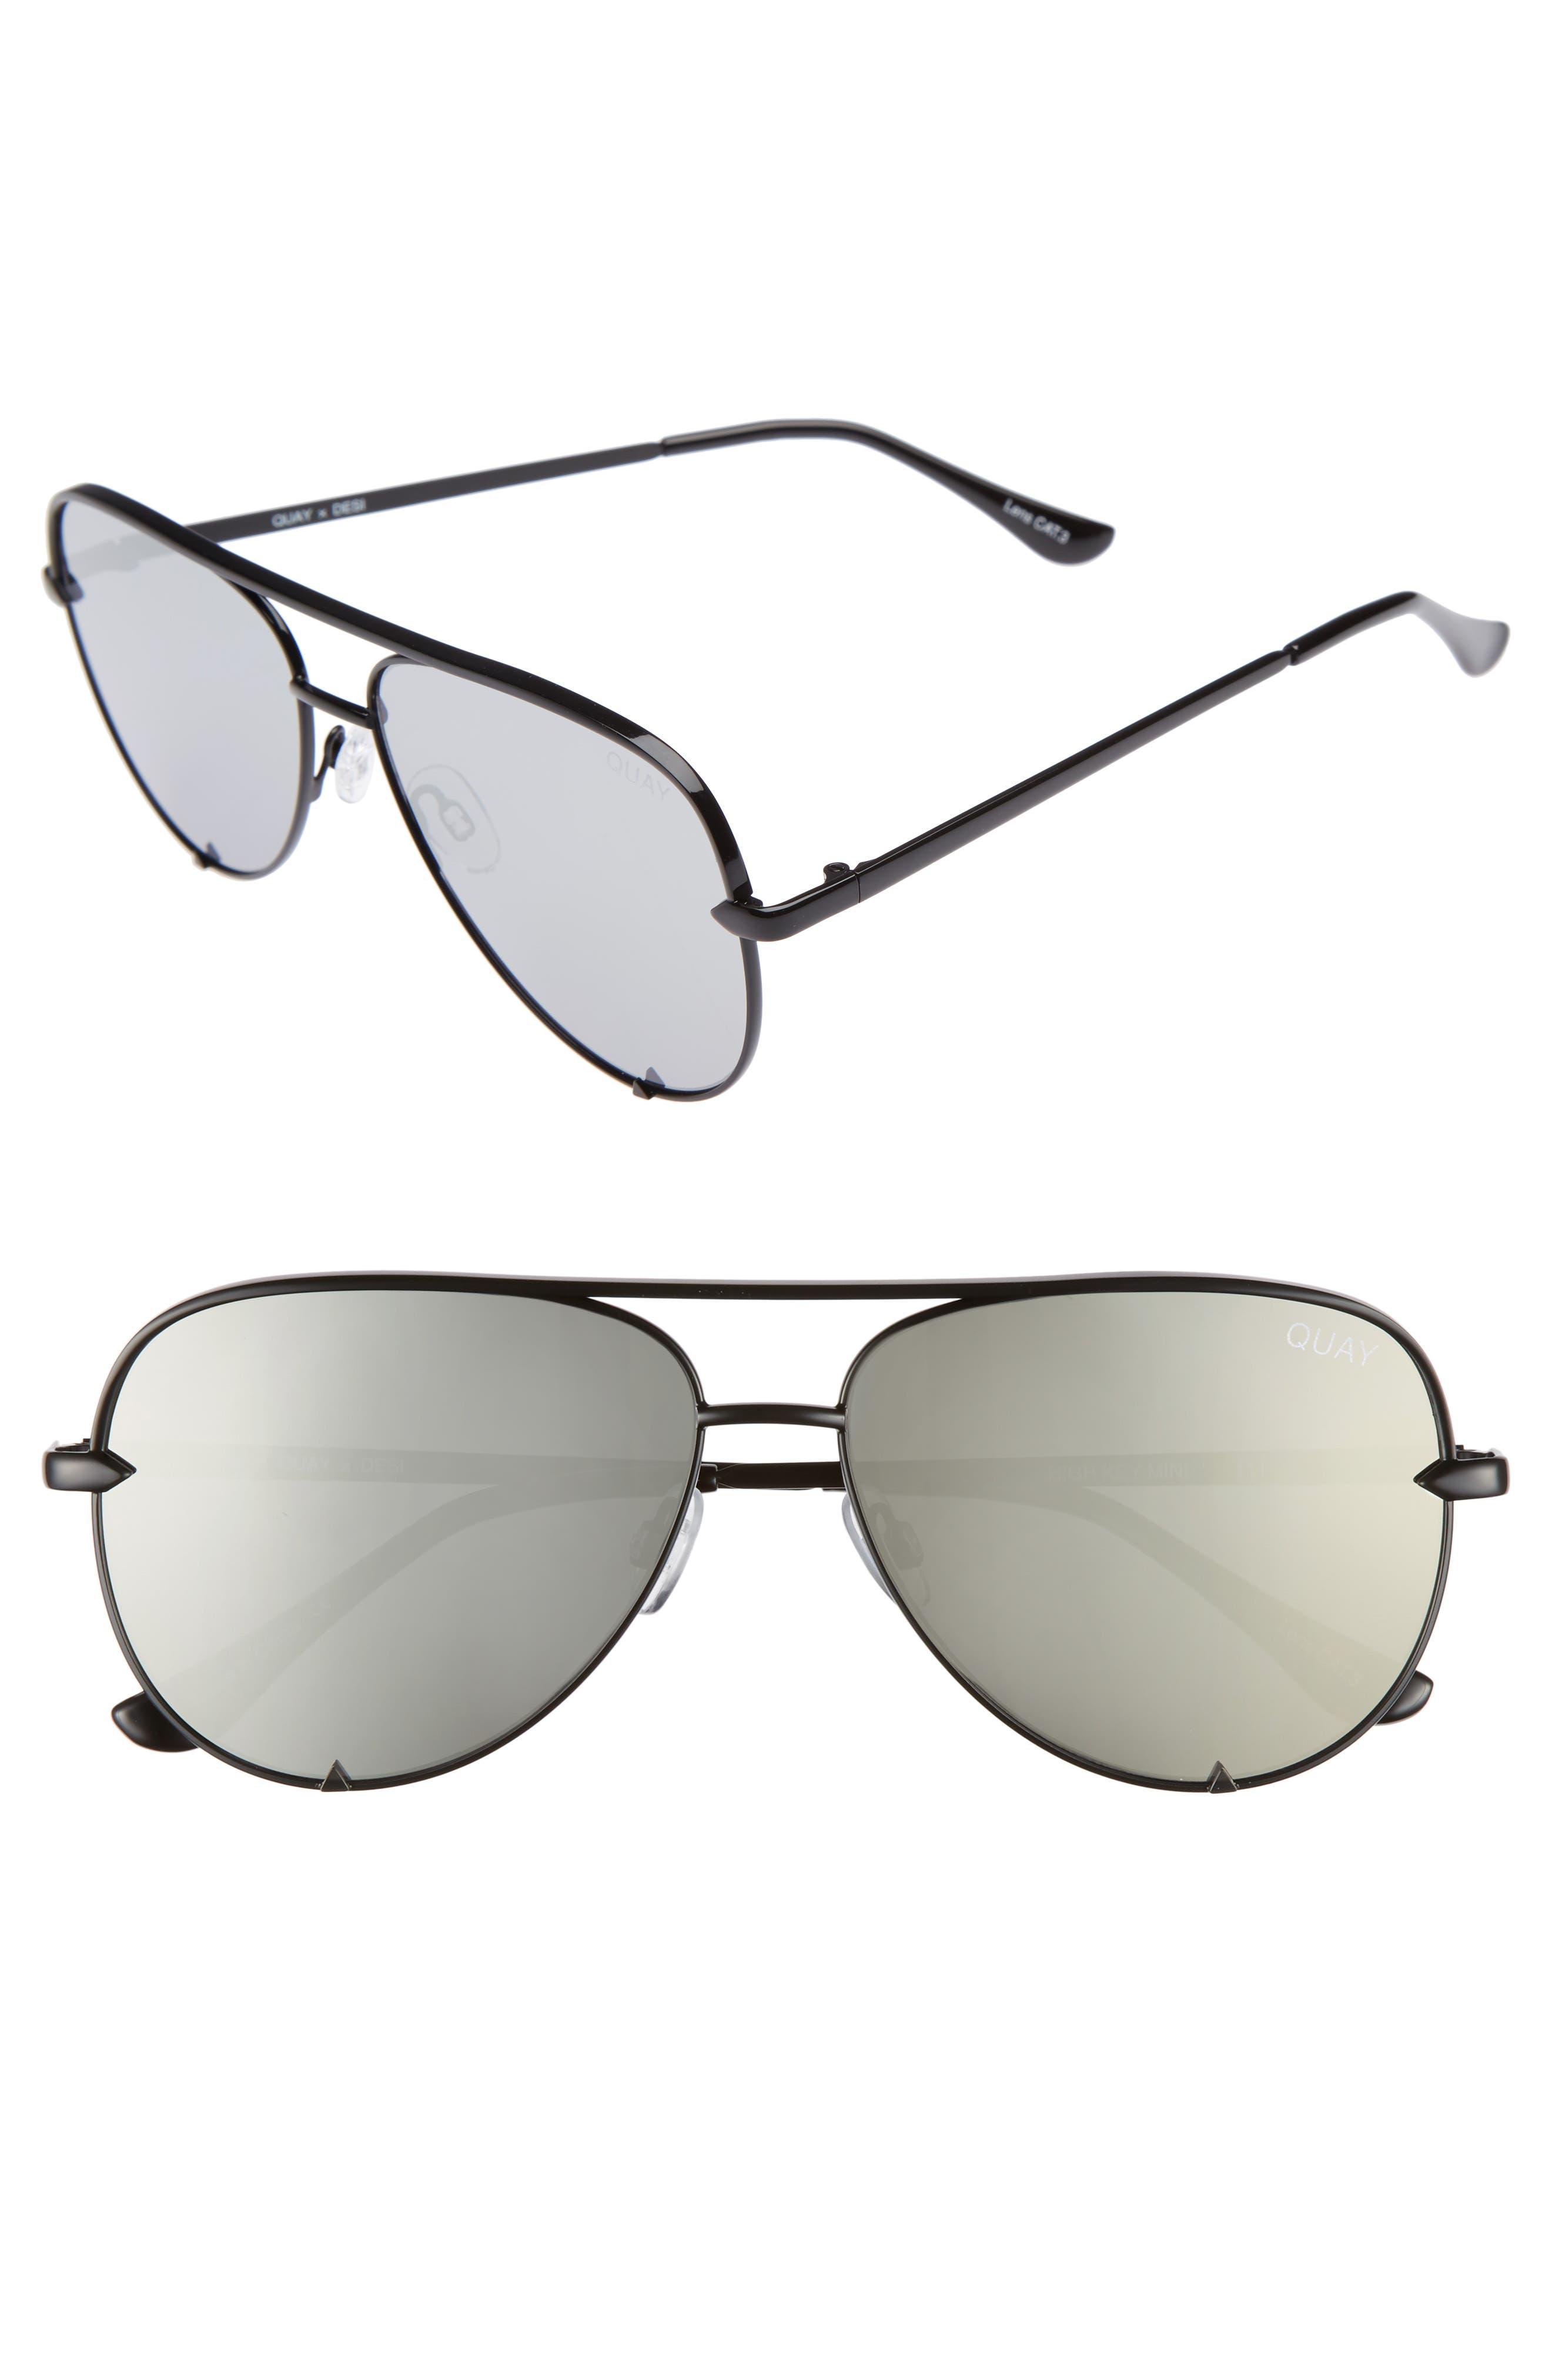 Quay Australia x Desi Perkins High Key Mini 57mm Aviator Sunglasses